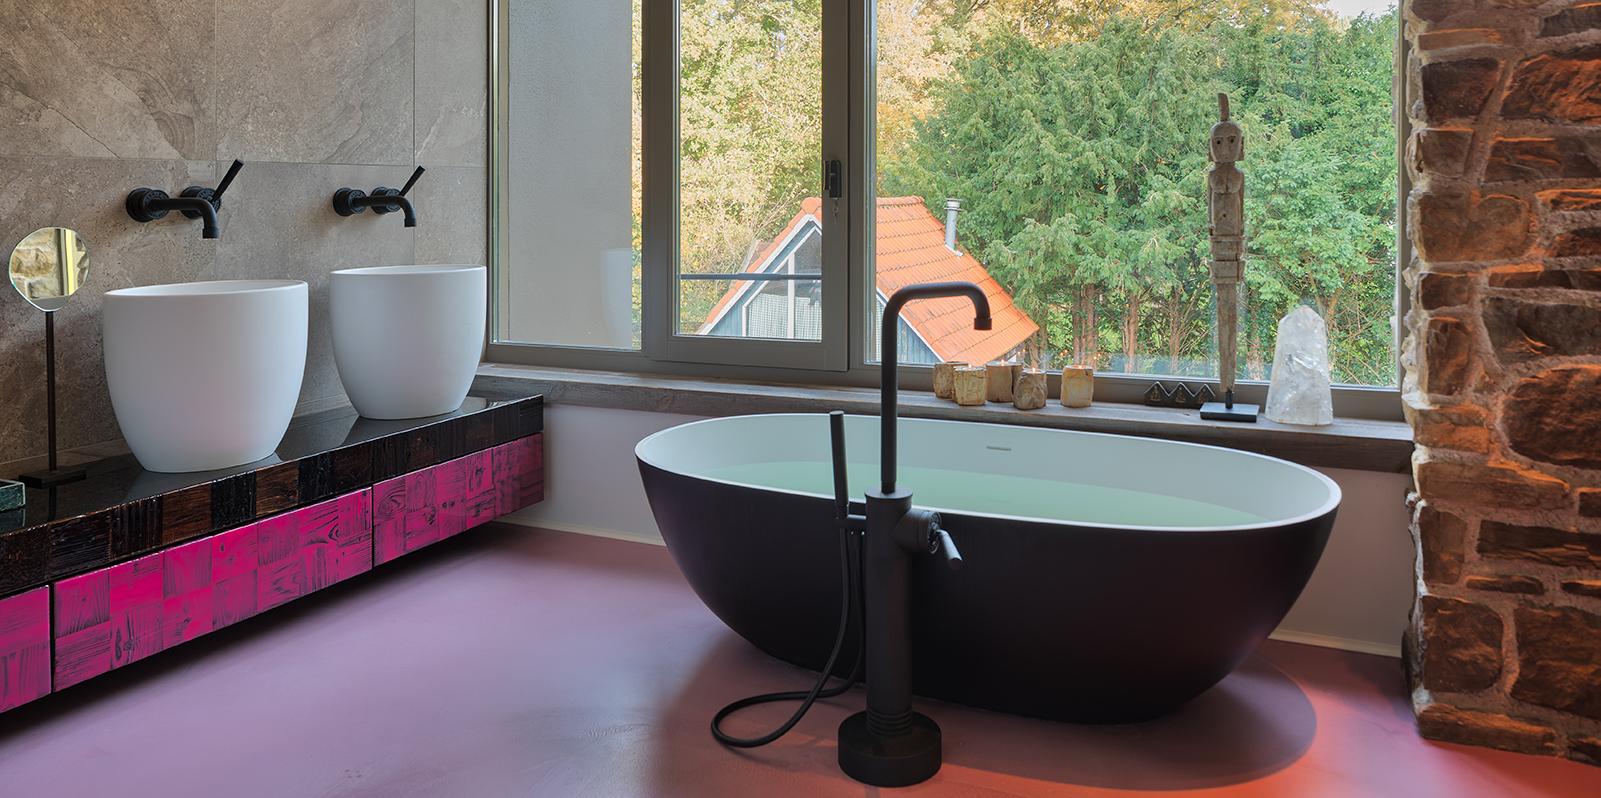 badkamer inspiratie, 5x mooiste badkamers